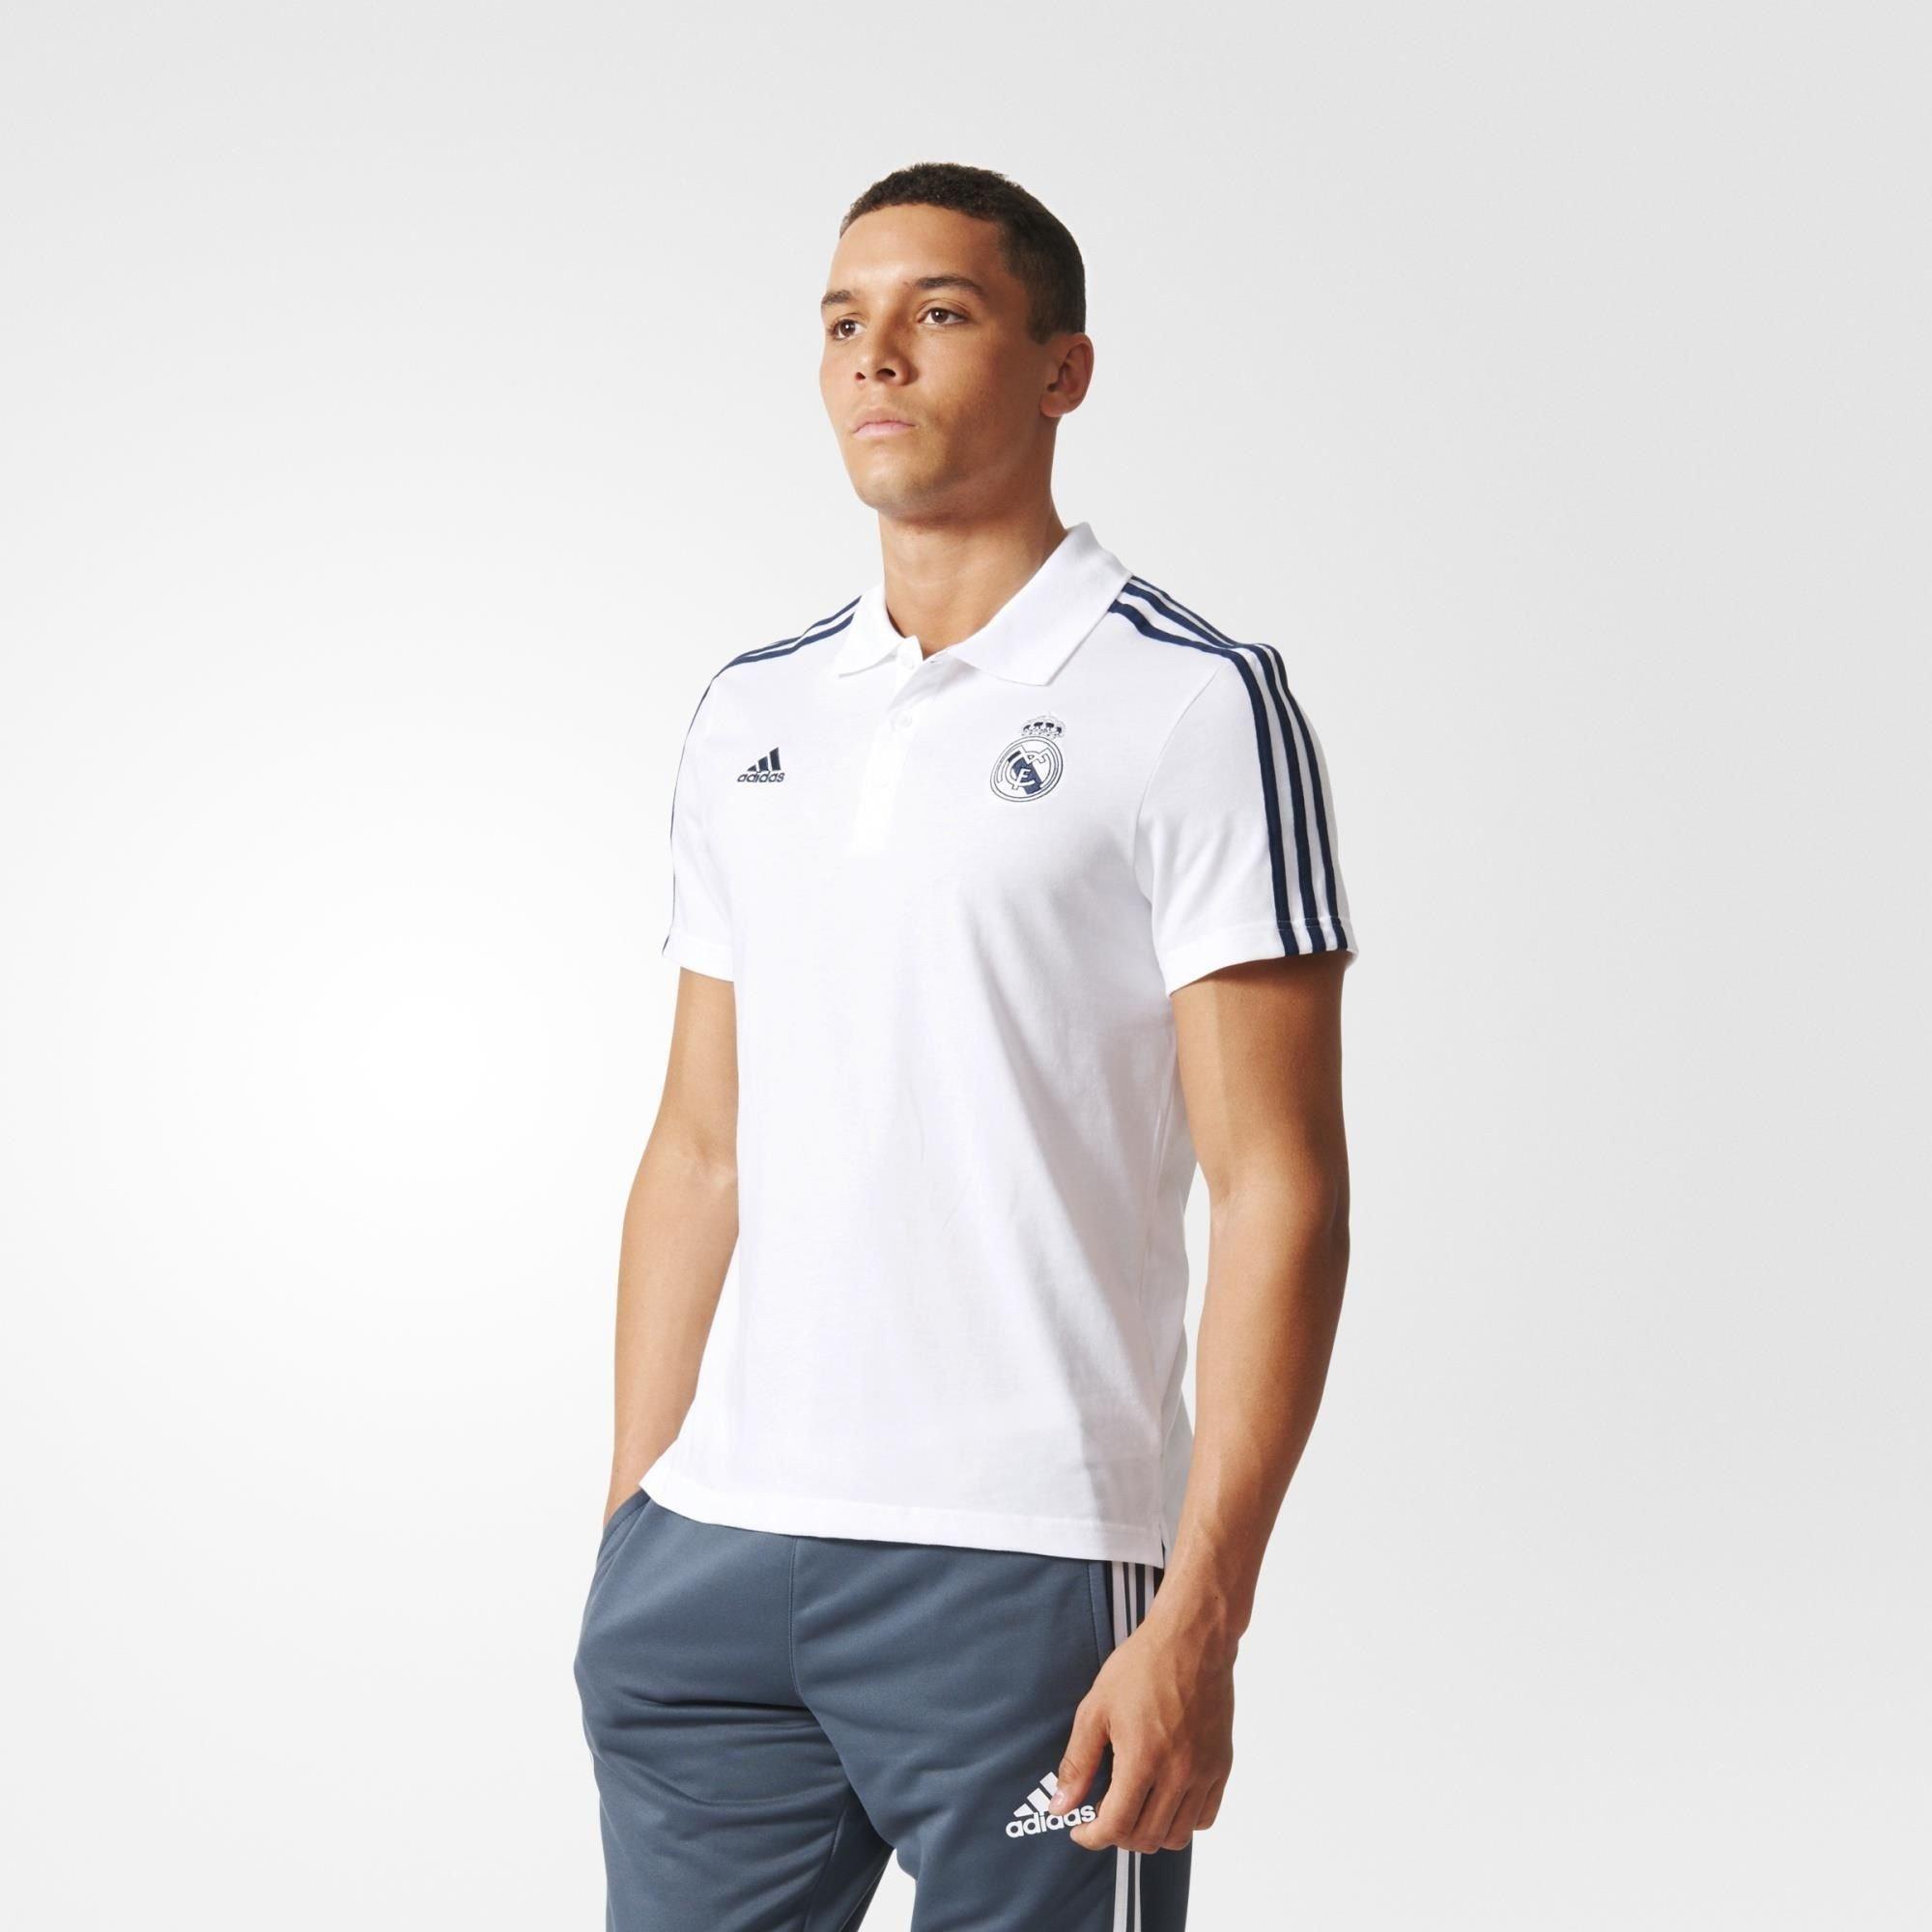 Men s Adidas T-Shirt - Real Madrid FC 3S Polo Tee - White ... 517749fbf